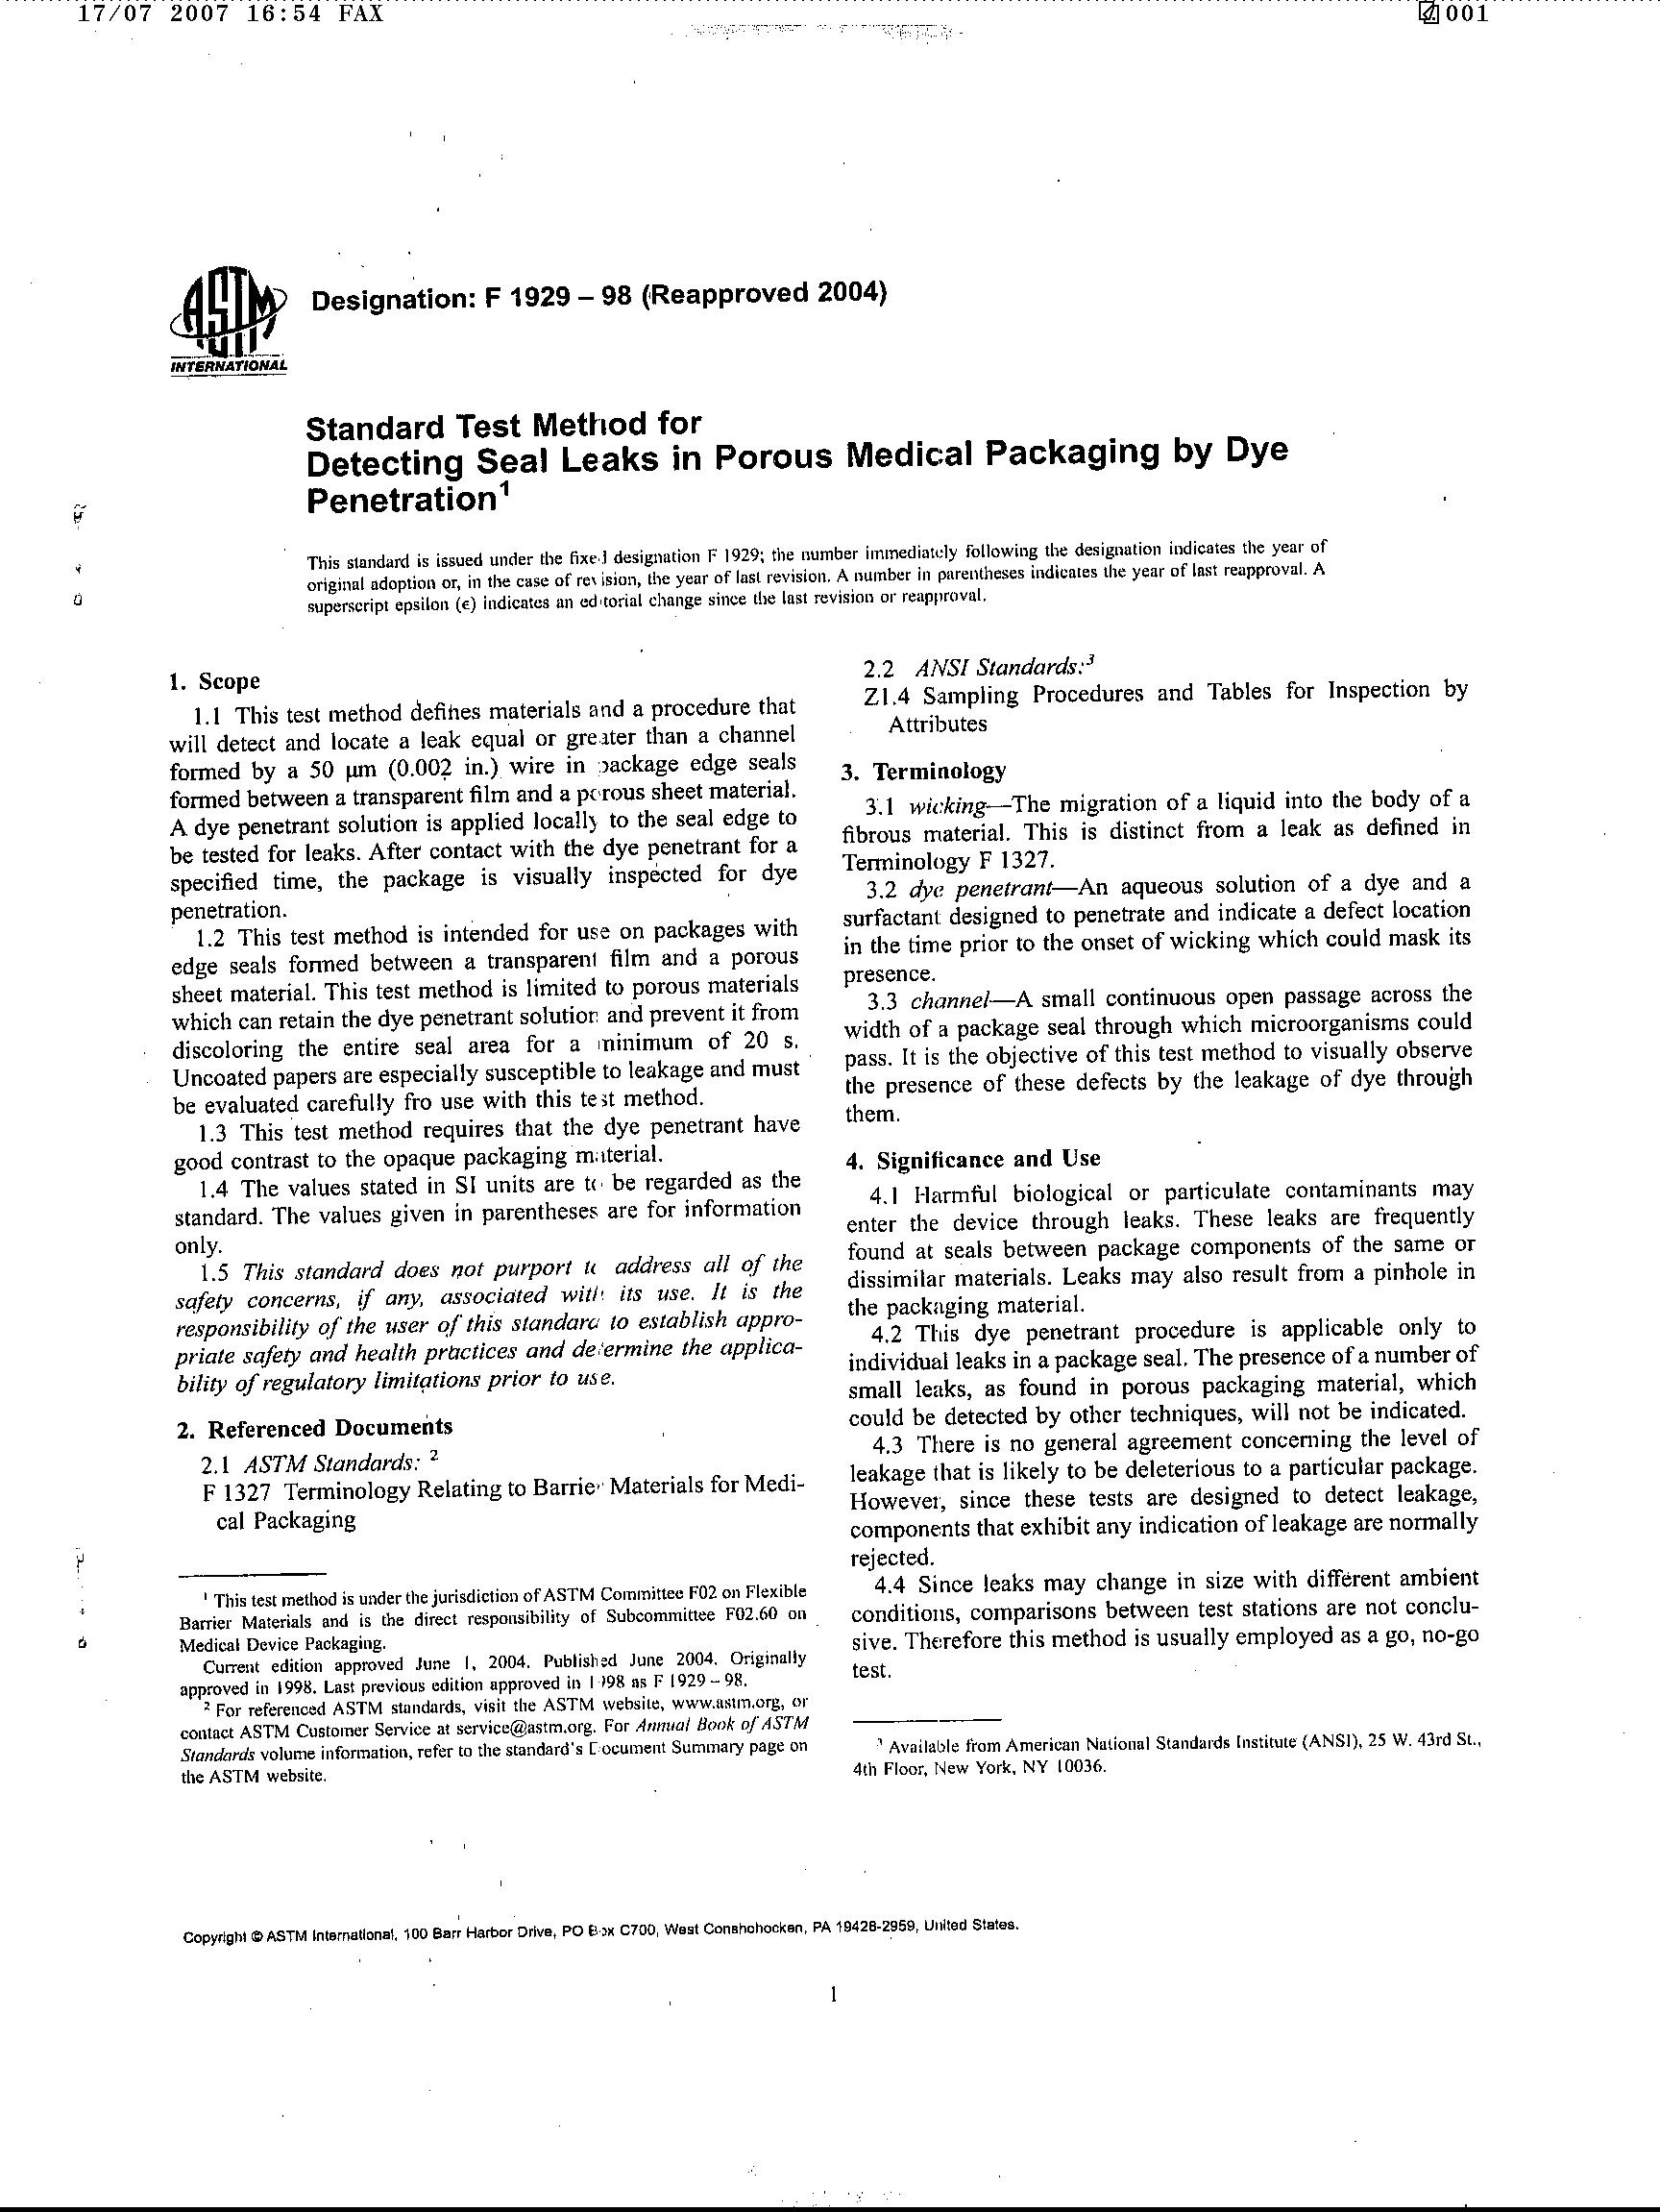 ASTM F1929-2004 Dye Penetration Test_文档之家